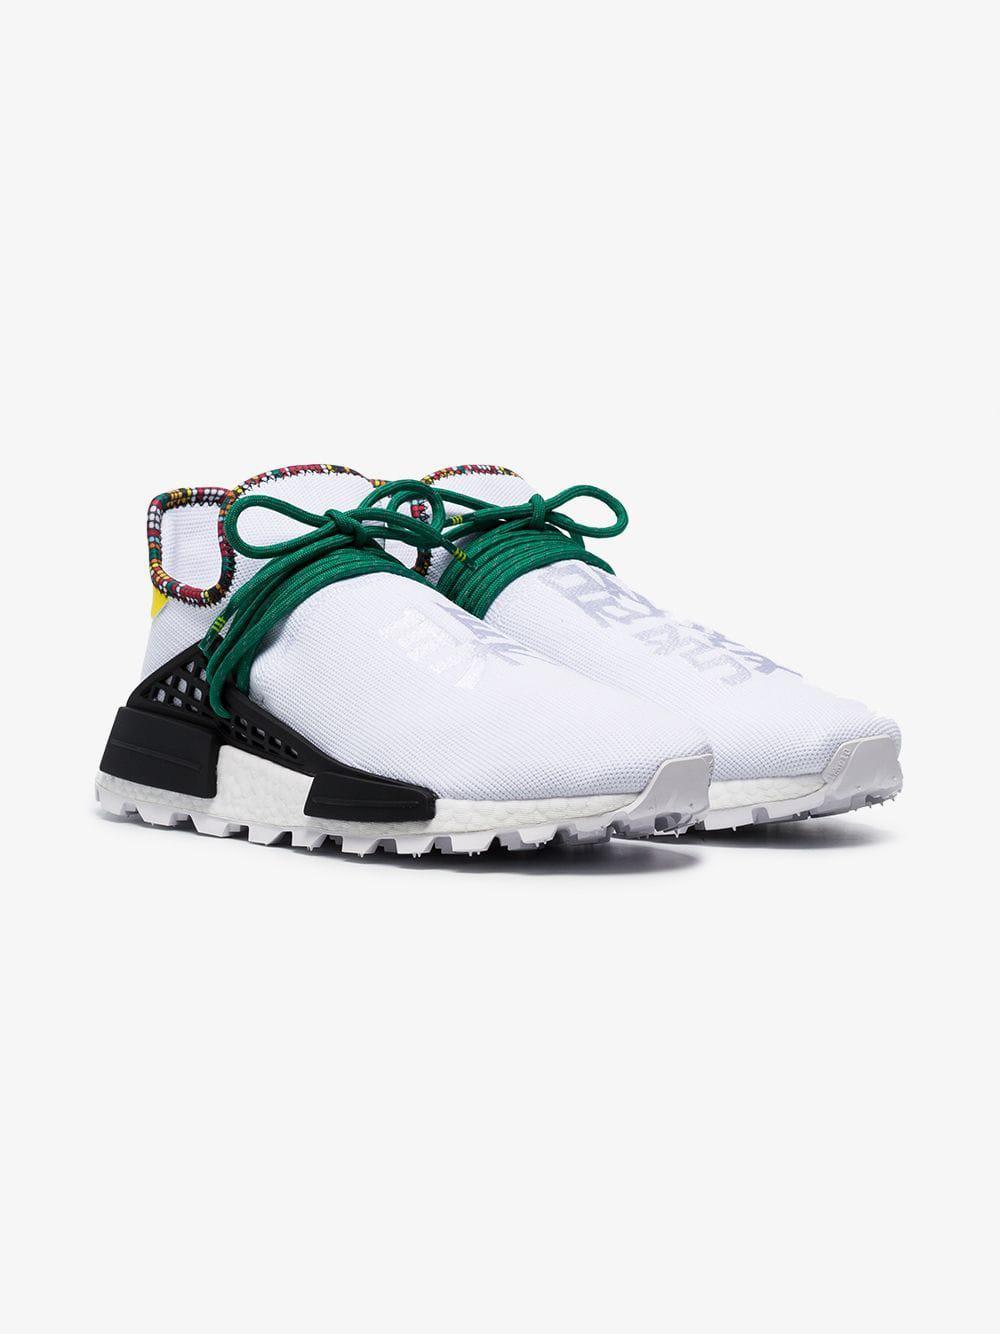 7994c7f81b6aa Lyst - adidas By Pharrell Williams X Pharrell Williams White Human ...